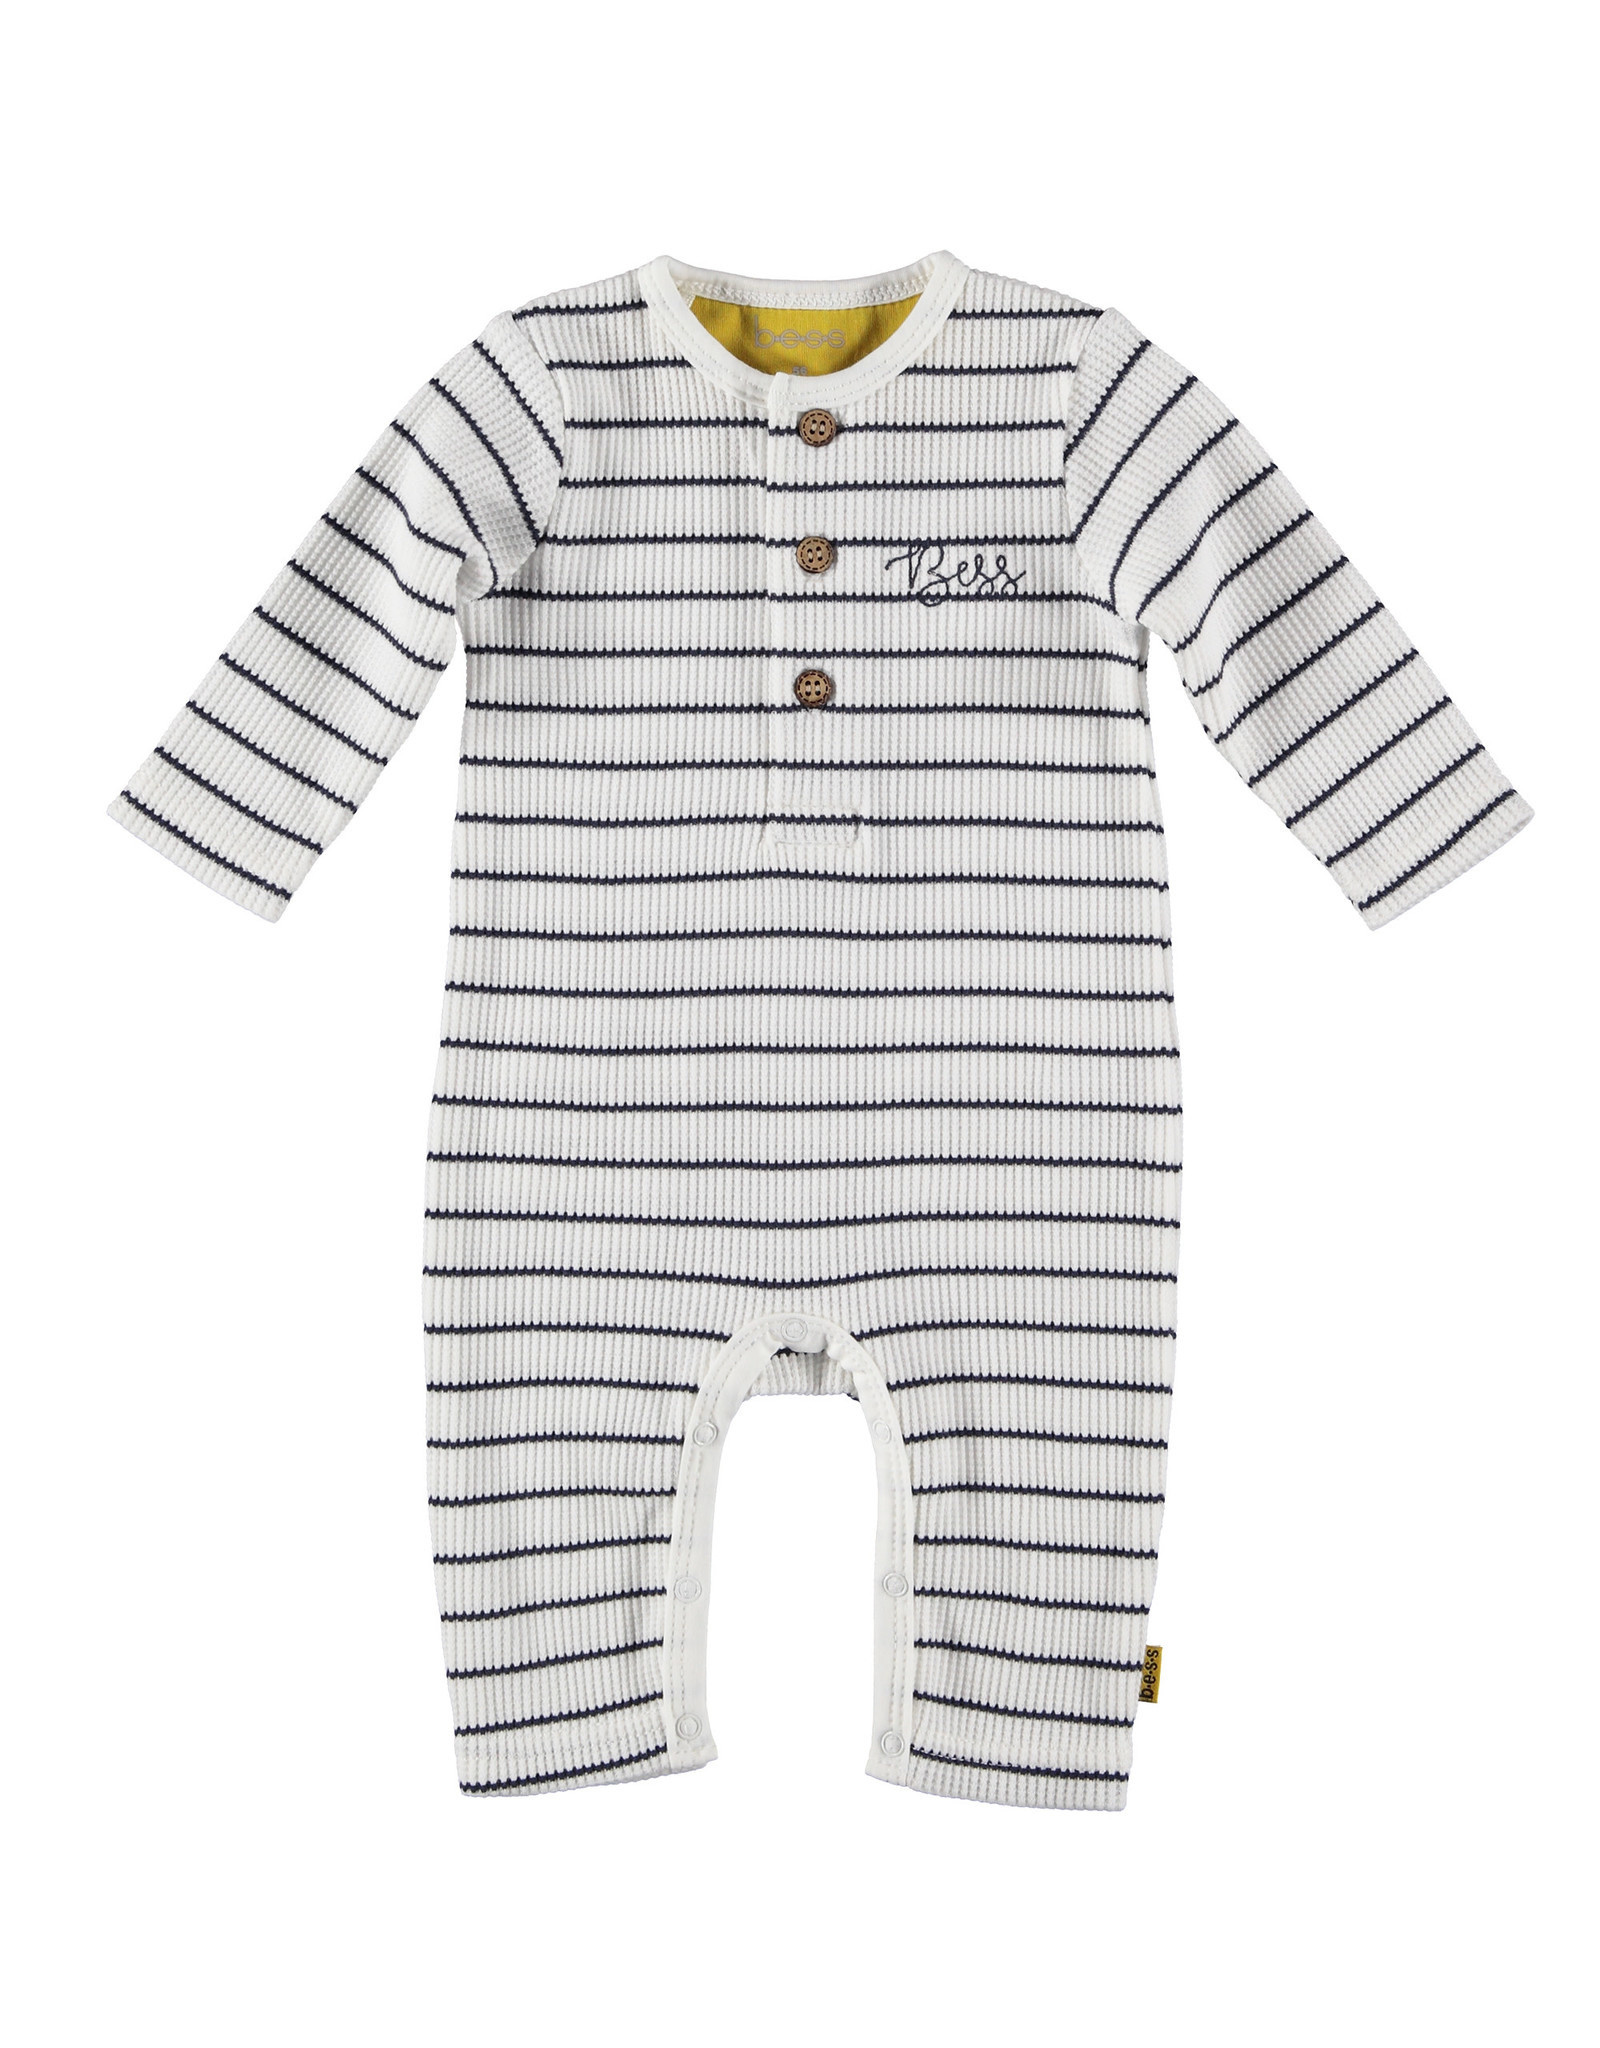 BESS BESS Suit Henley Striped White